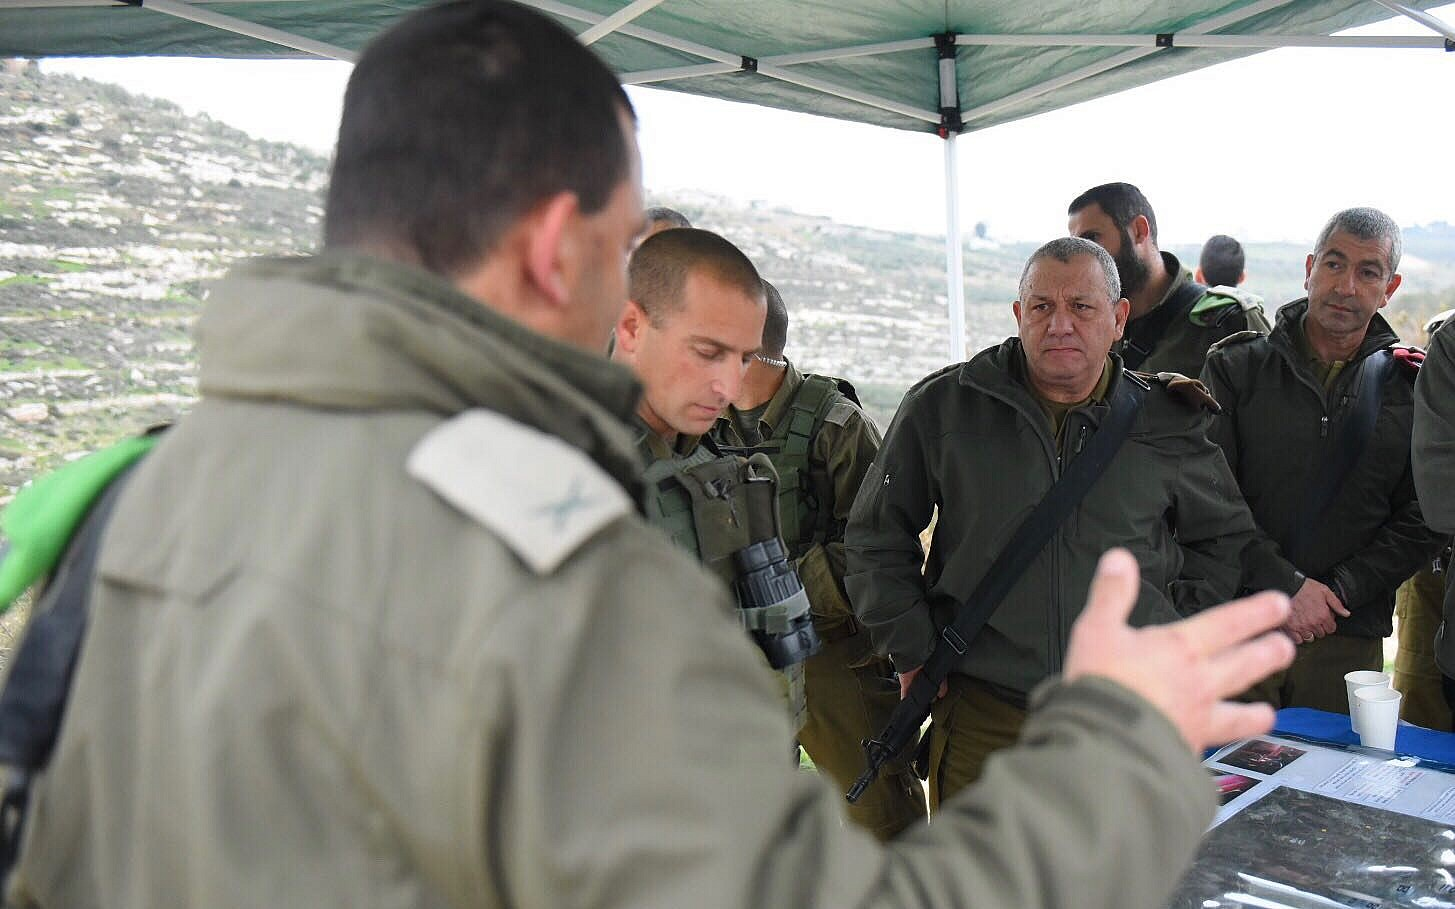 U.S.  vice president Pence to visit Jordan on January 21st